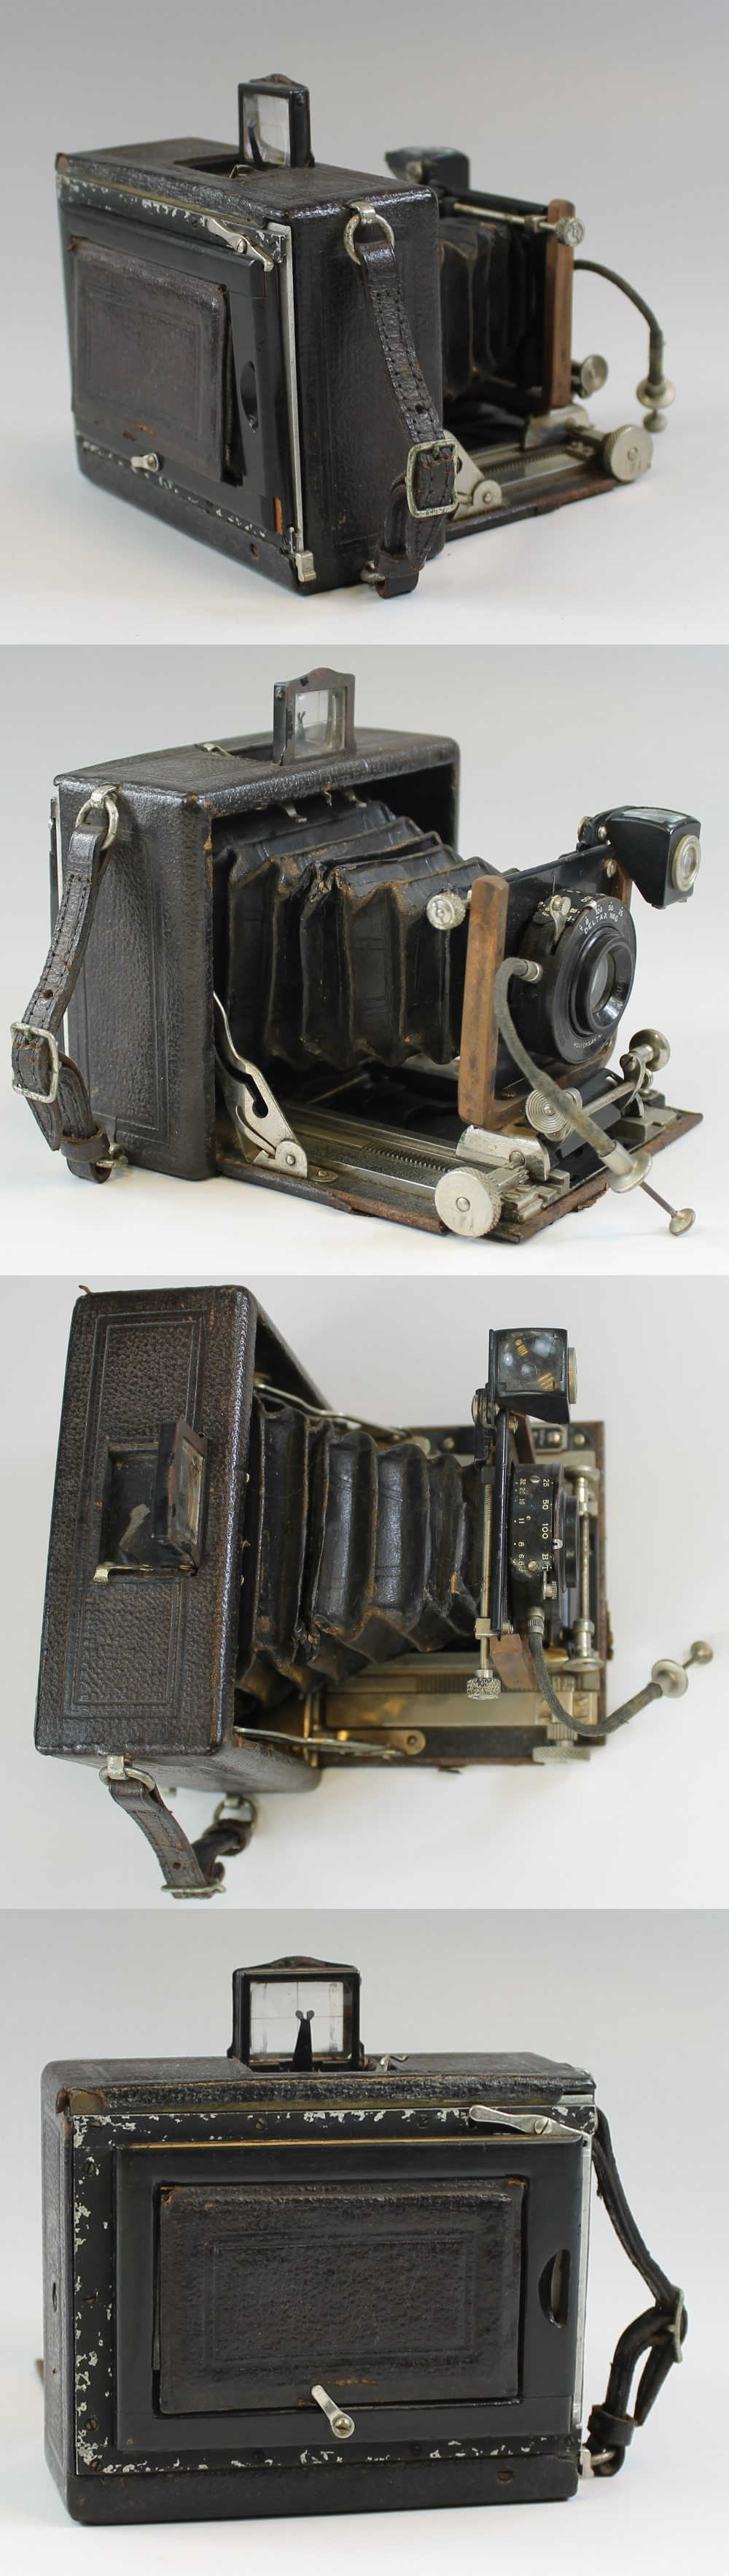 309蛇腹式カメラ六櫻社2